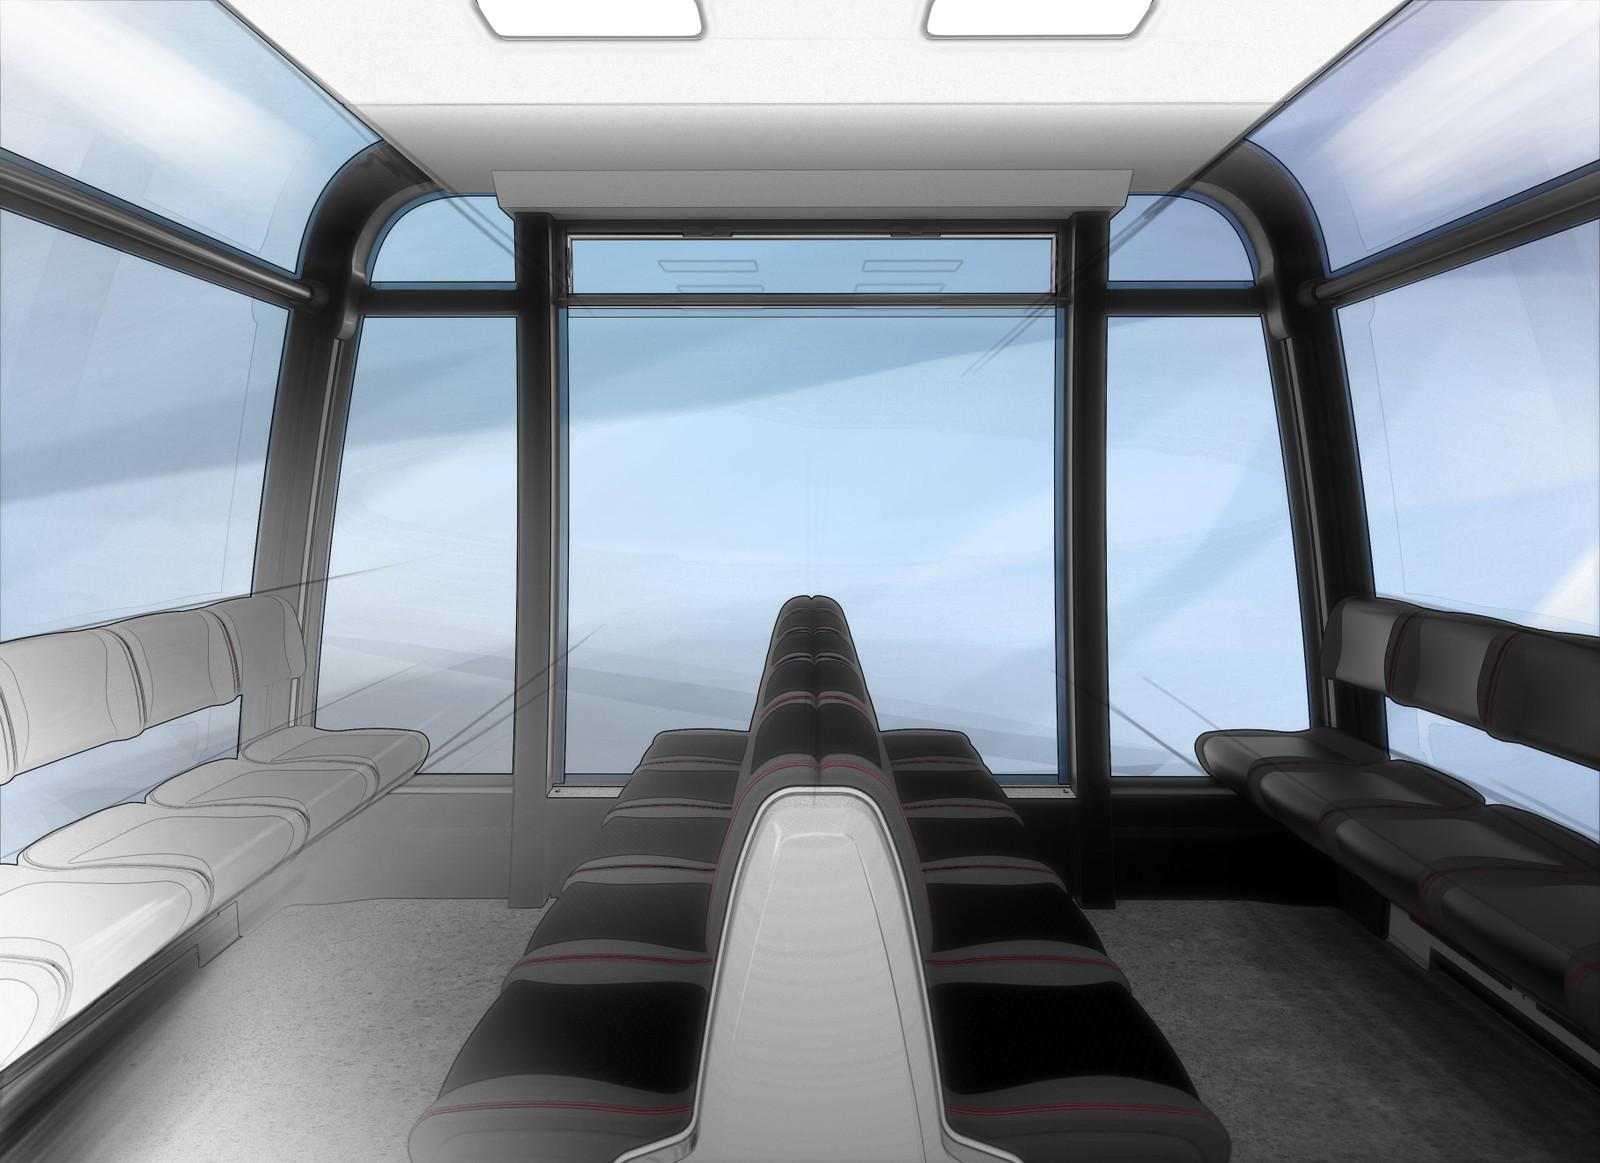 Det vil være plass til ca. 35 personer i hver kabin.